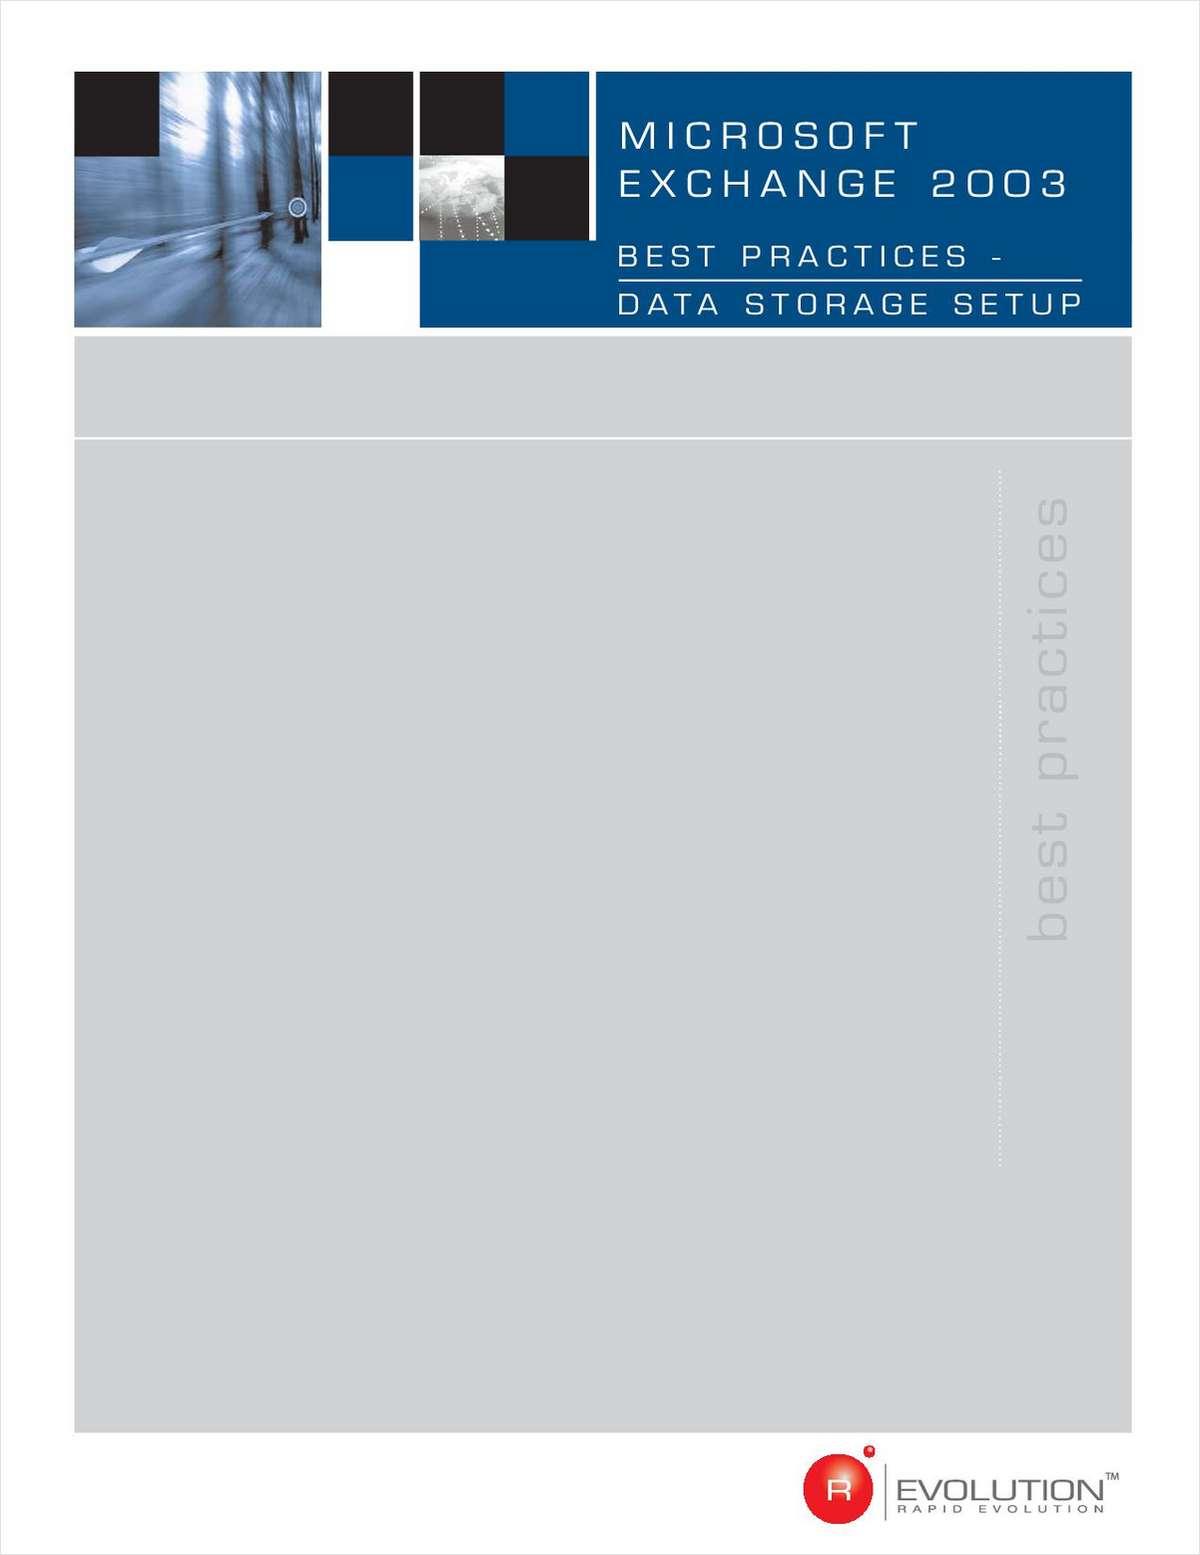 Microsoft Exchange Server 2003: Best Practices for Data Storage Setup